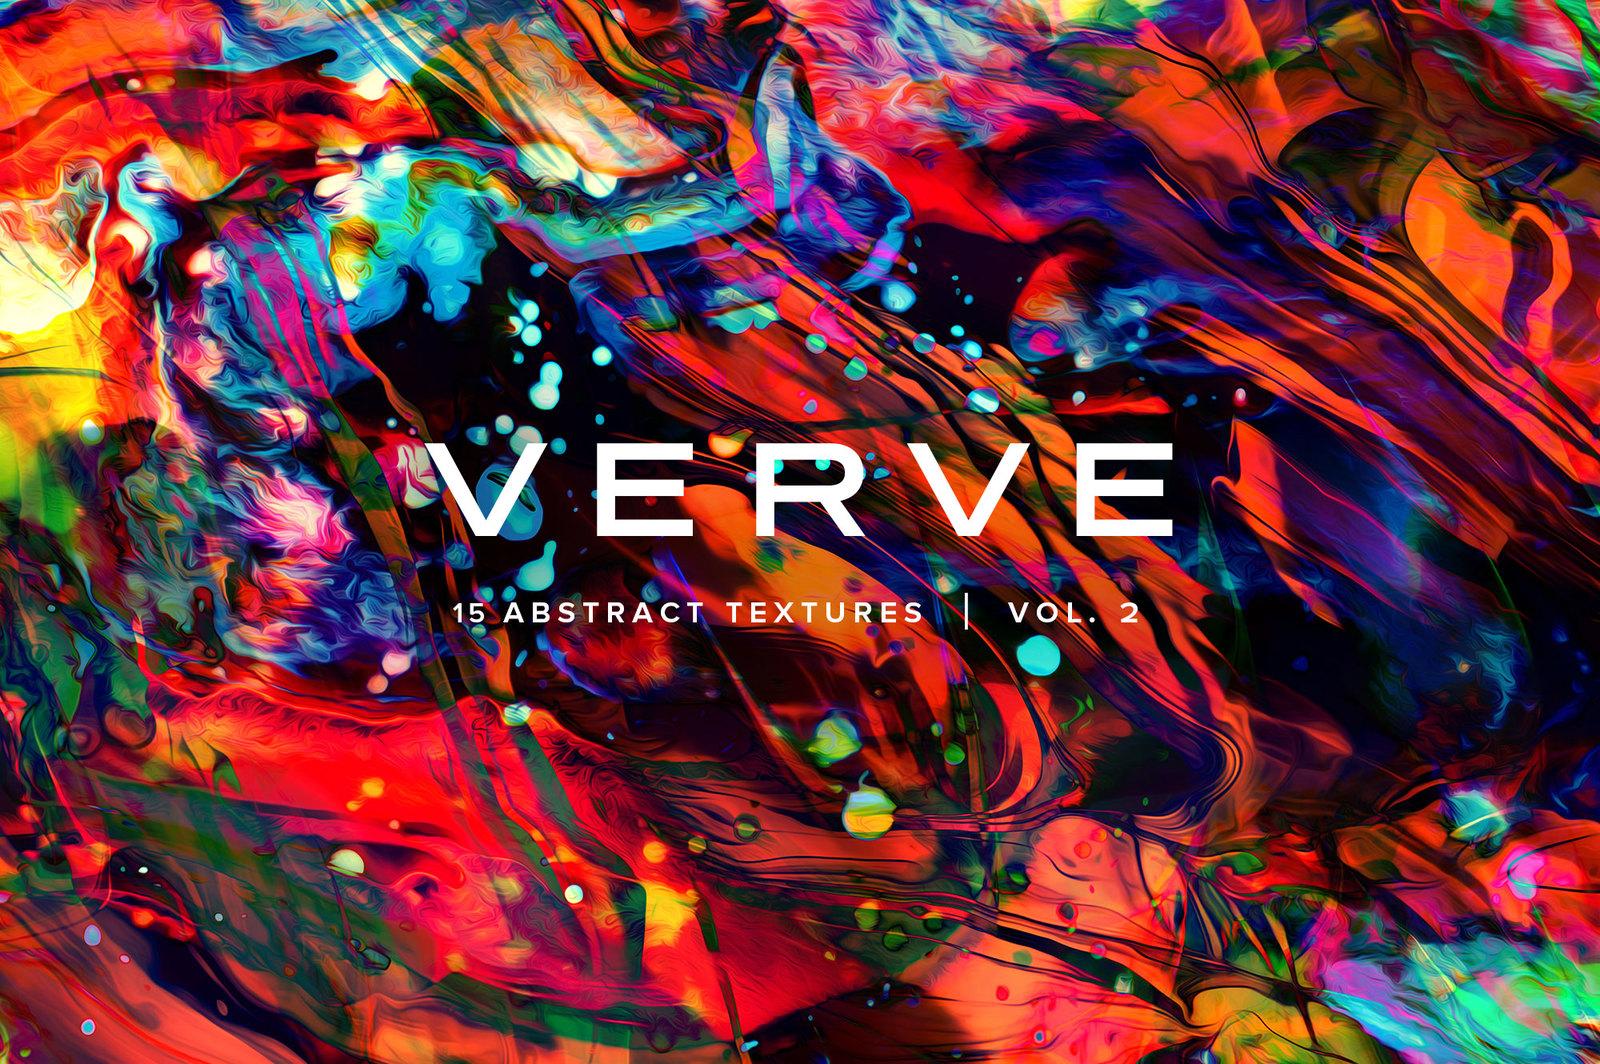 Verve, Vol. 2: 15 Abstract Textures